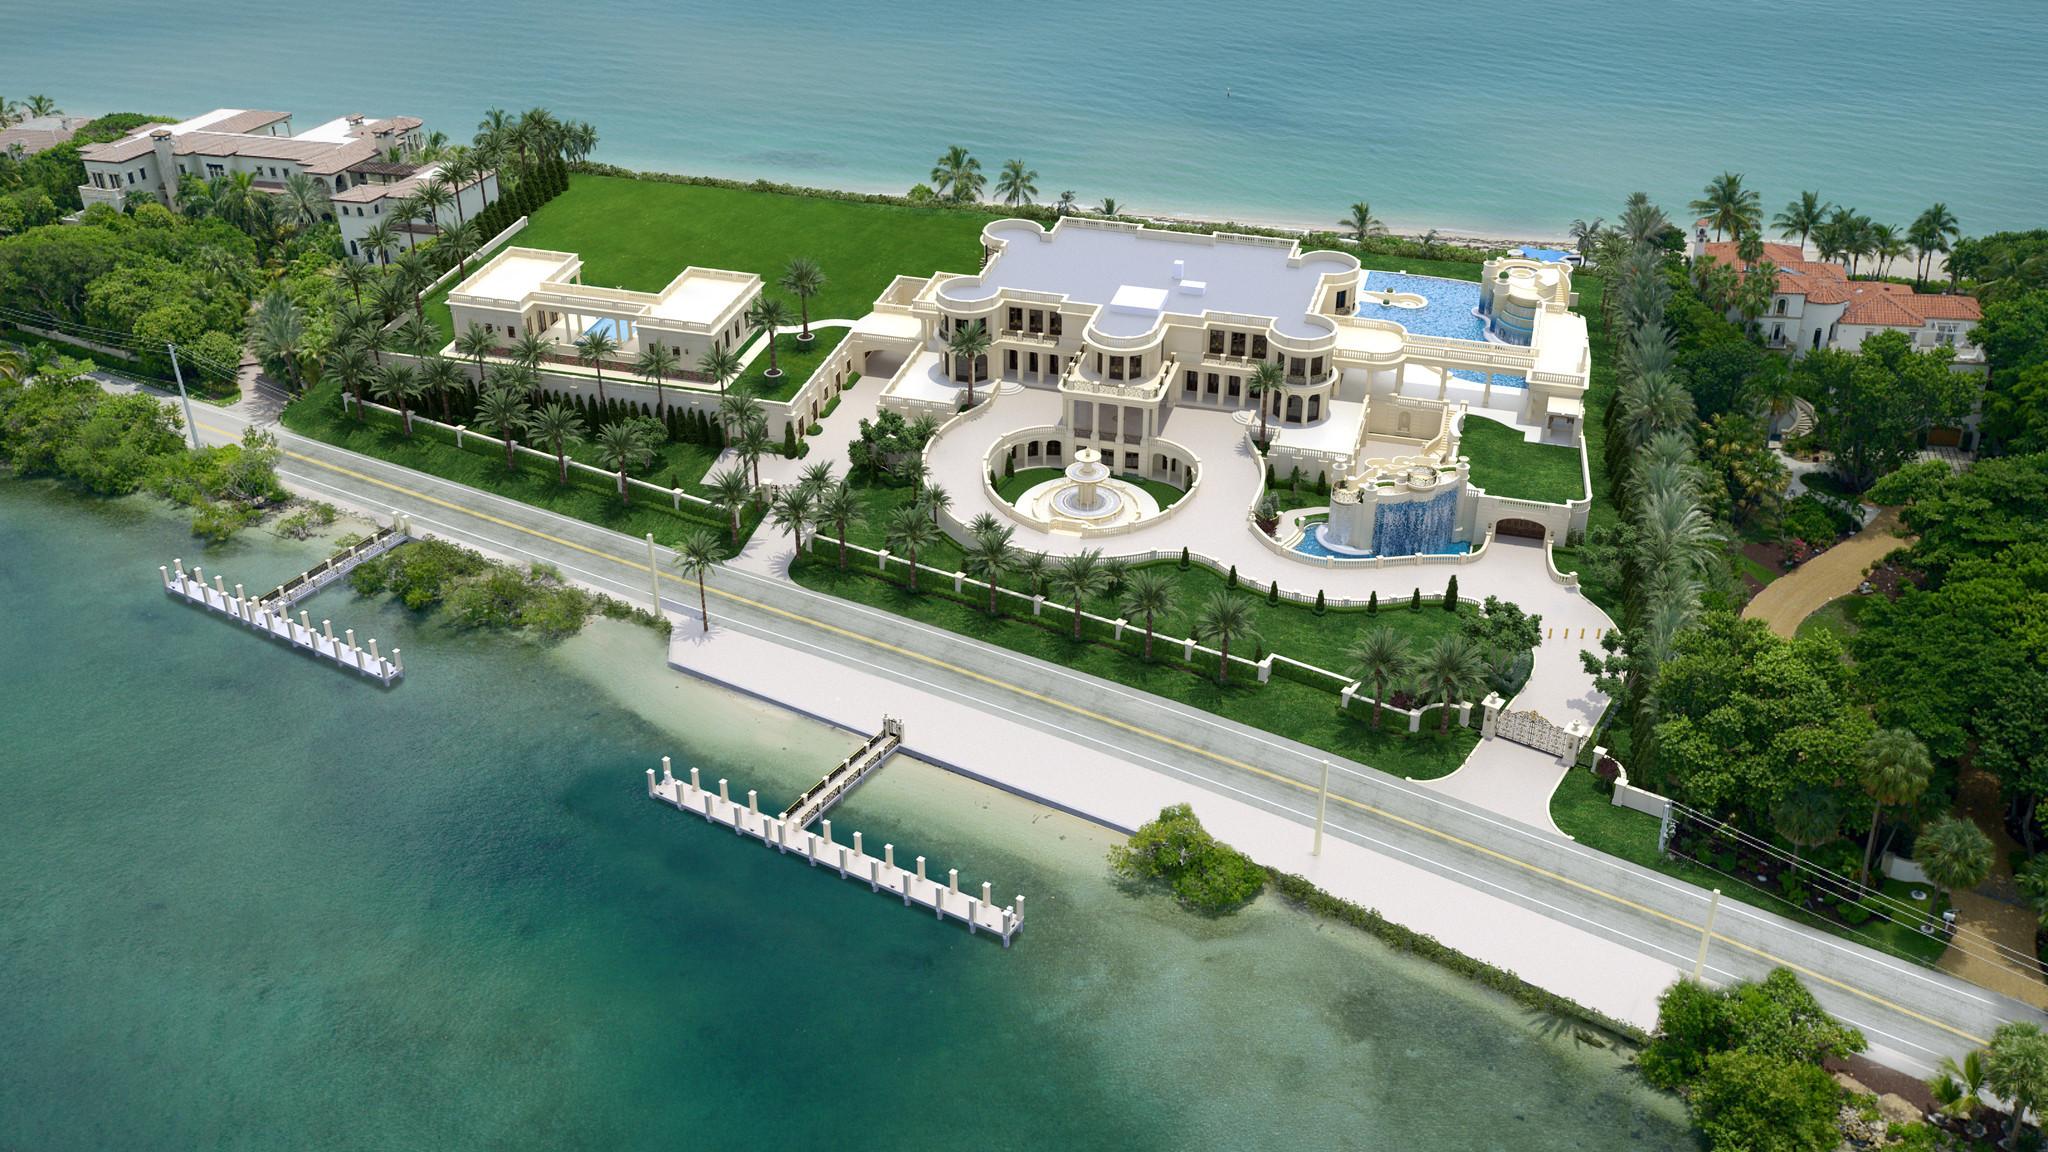 Housing market le palais royal will hit the market for 159 million sun sentinel